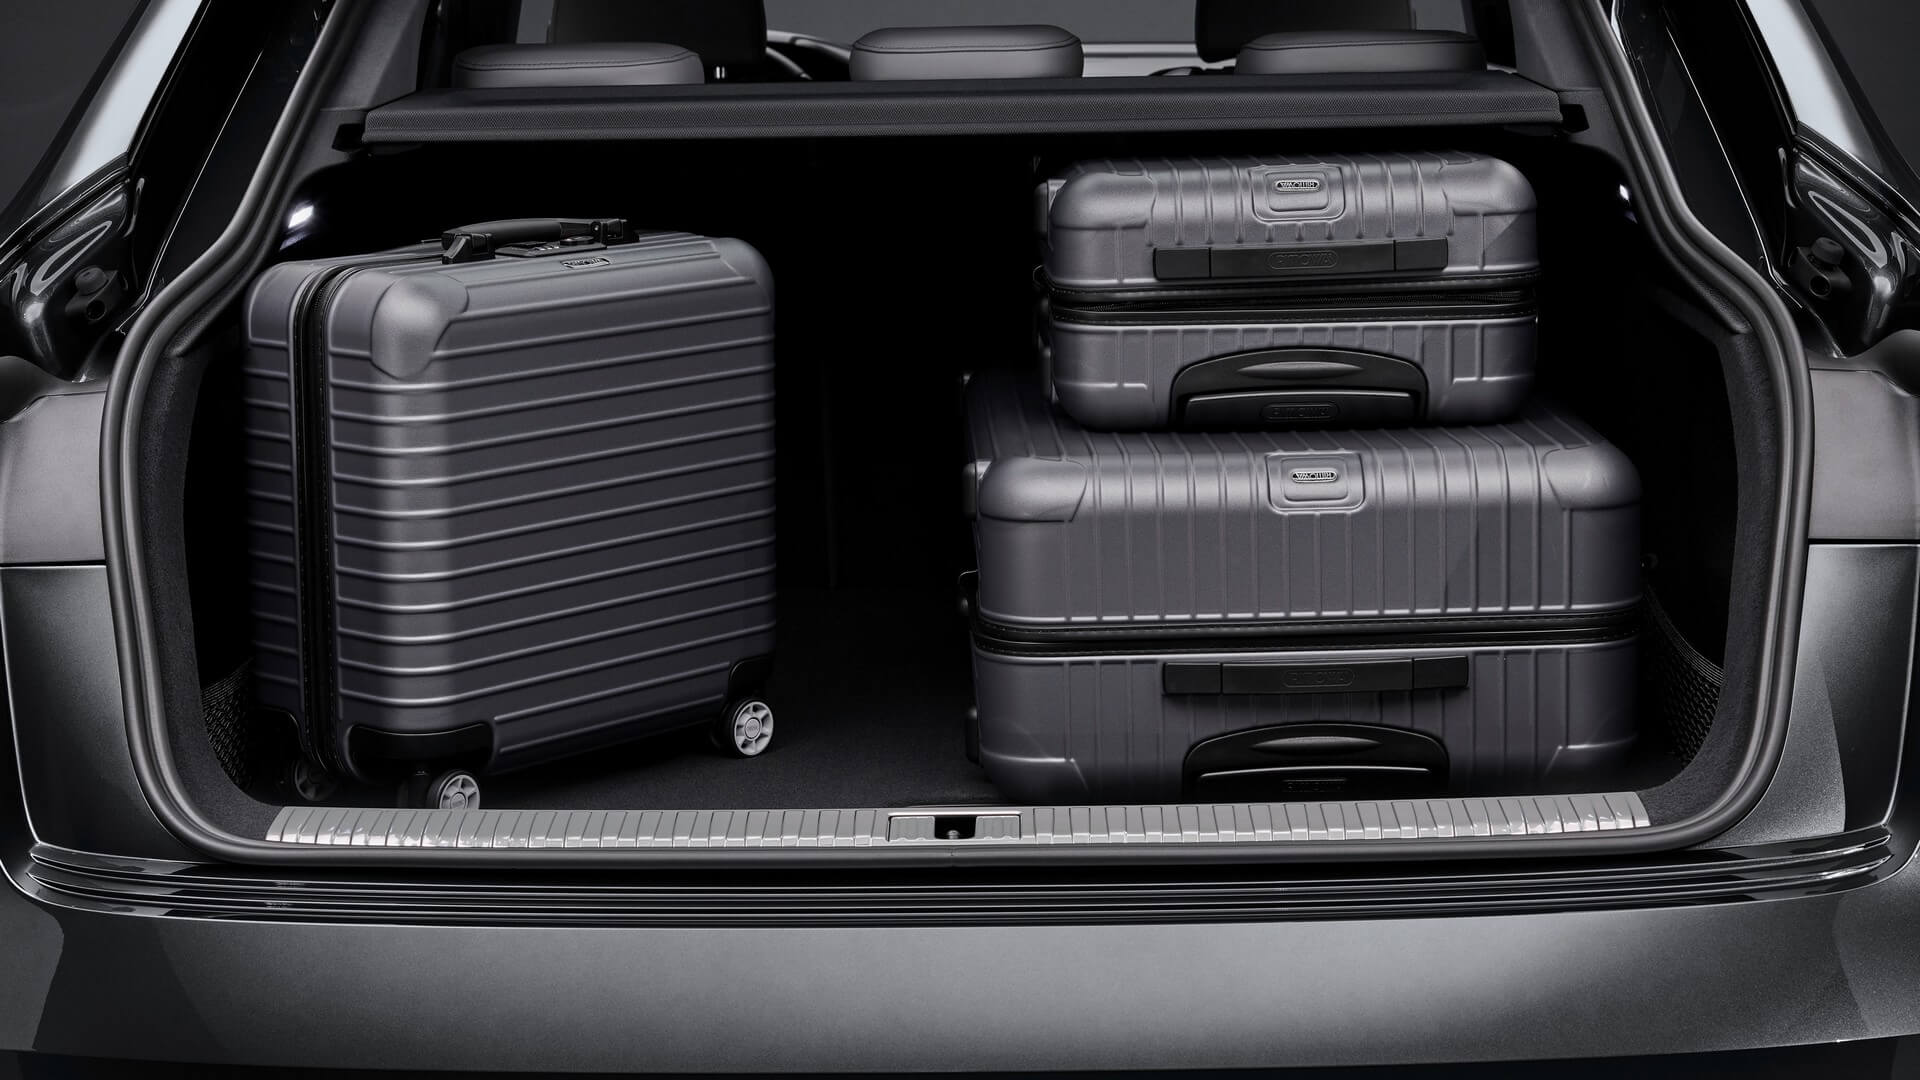 Audi-E-Tron-S-and-E-Tron-S-Sportback-2020-87